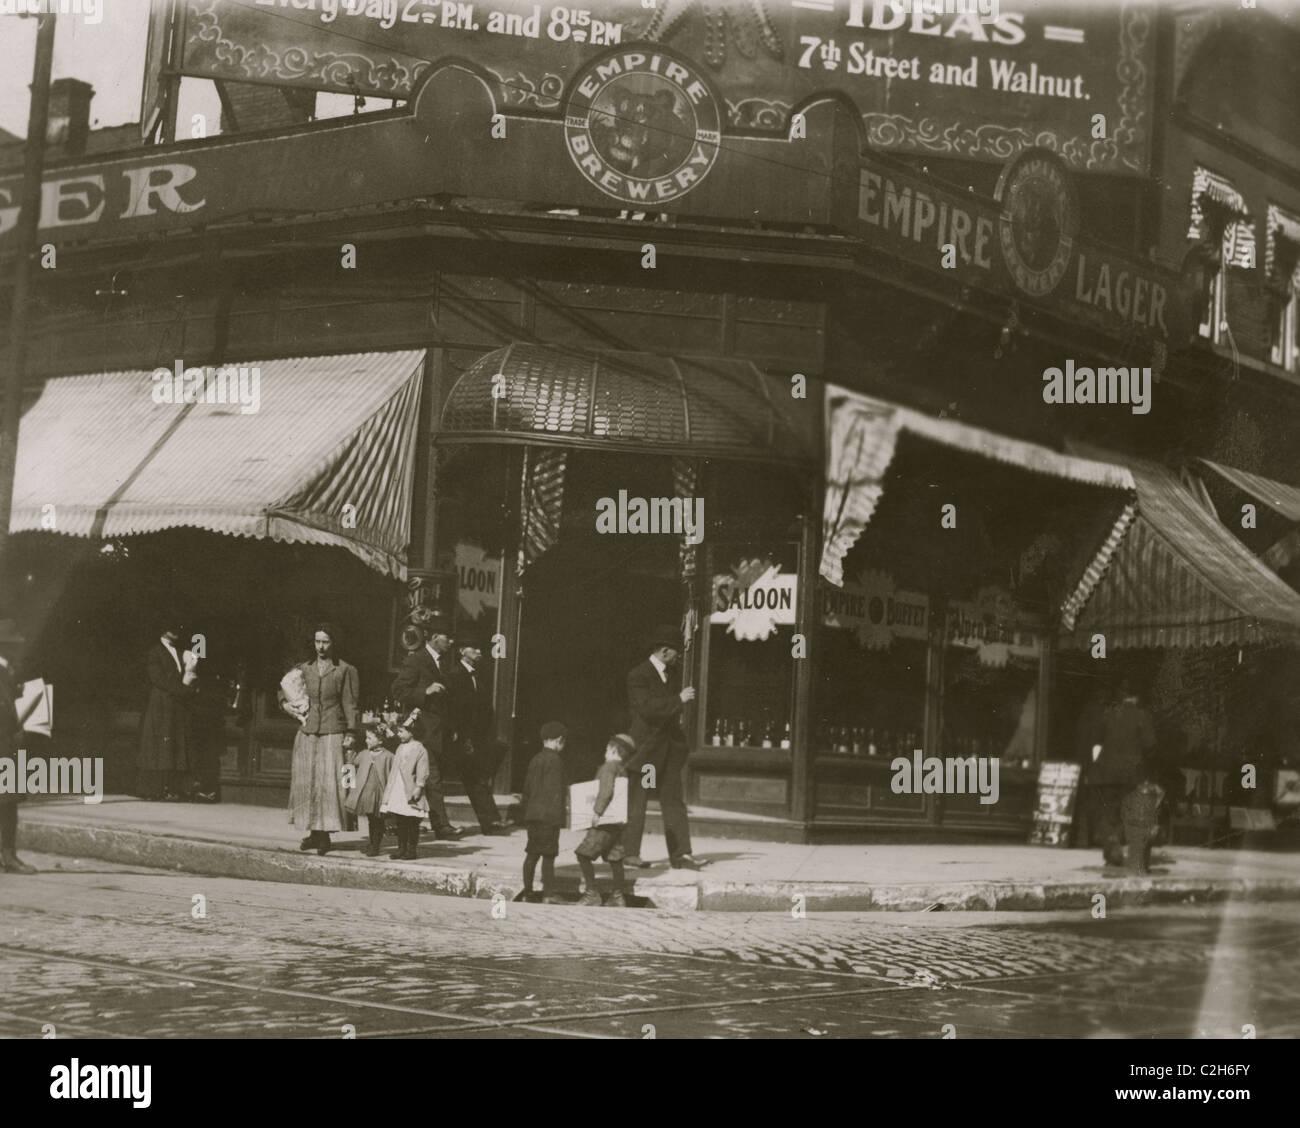 Newsies selling near saloon. - Stock Image